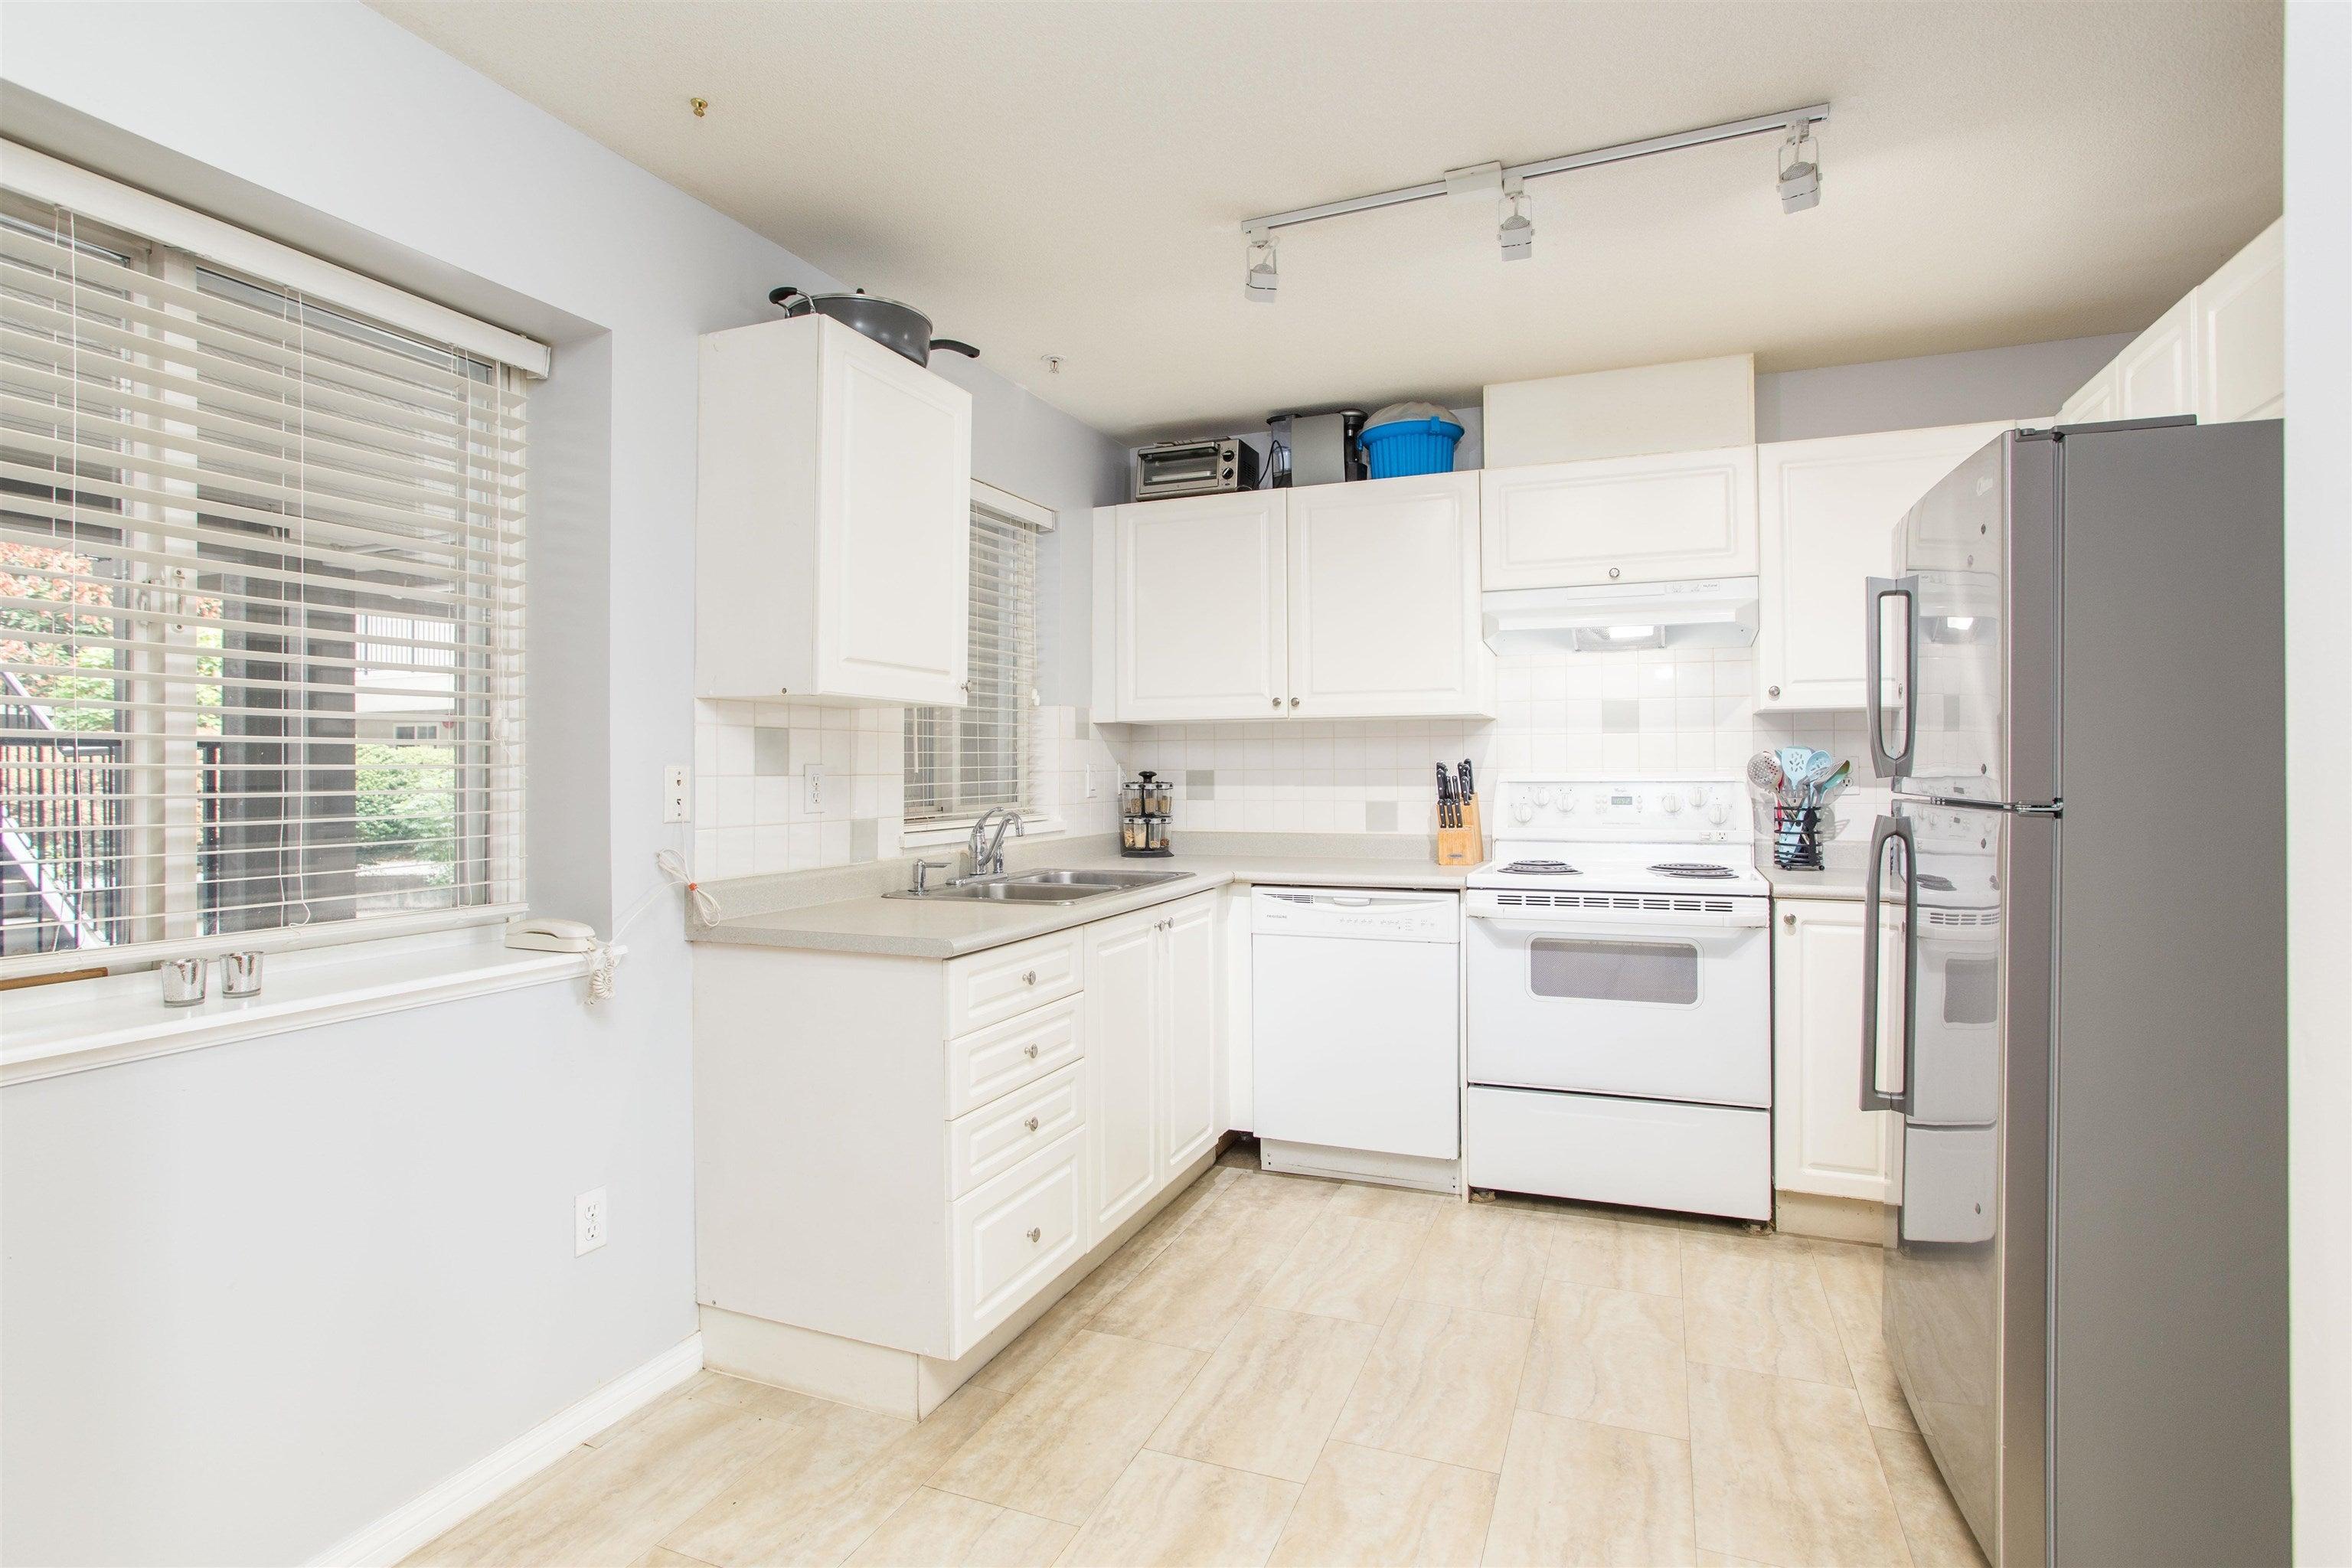 7 205 LEBLEU STREET - Maillardville Apartment/Condo for sale, 3 Bedrooms (R2625671) - #9